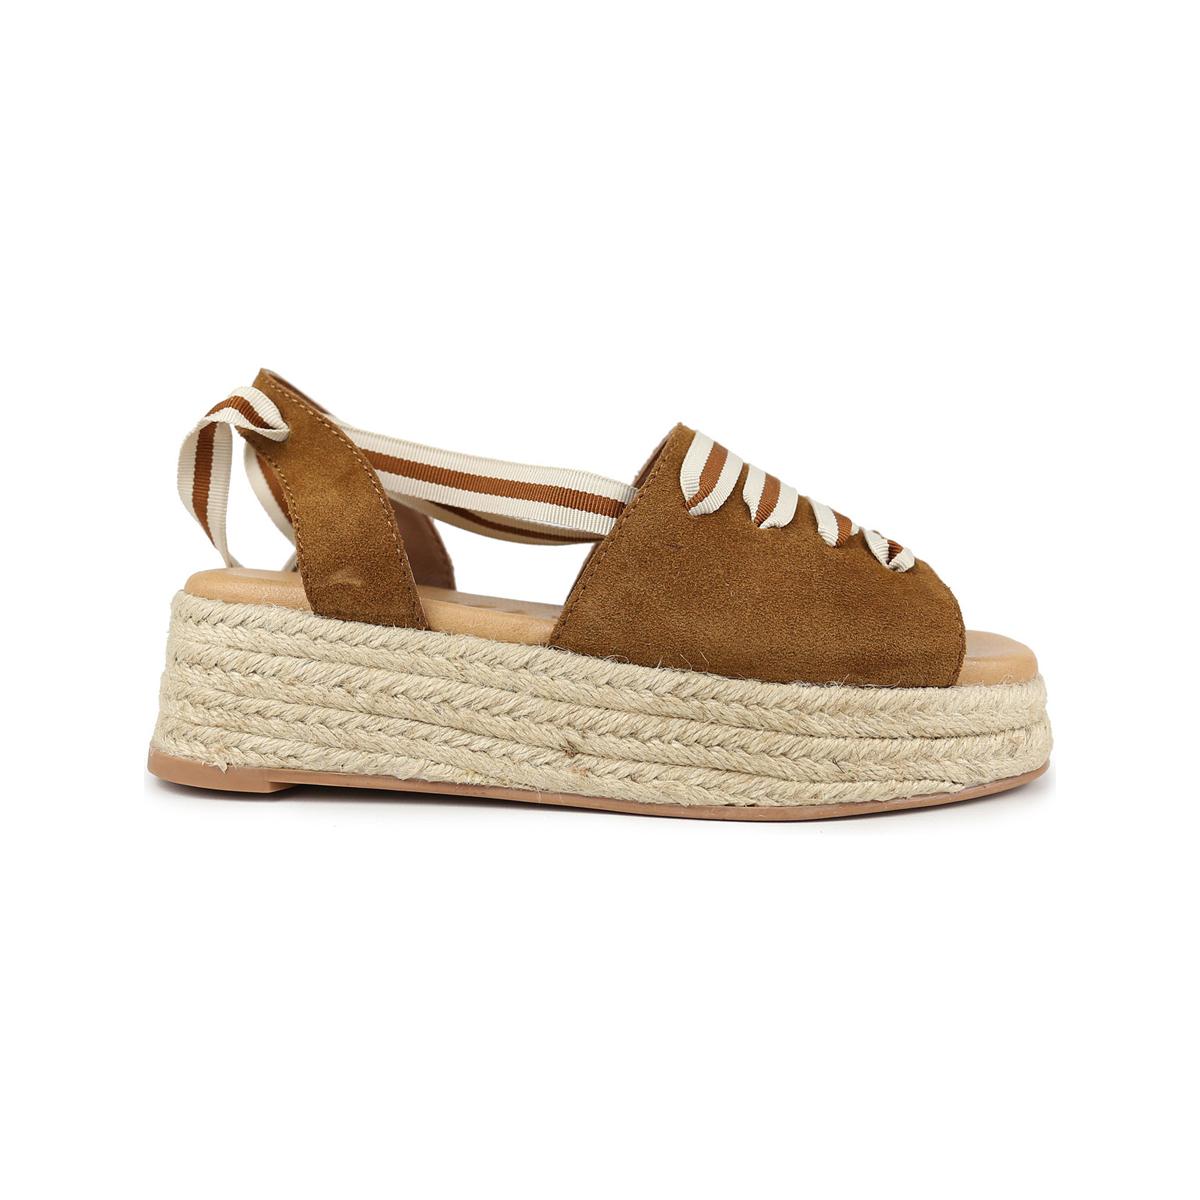 Comprar Chika10 Bonita 02 Sandálias de couro preto